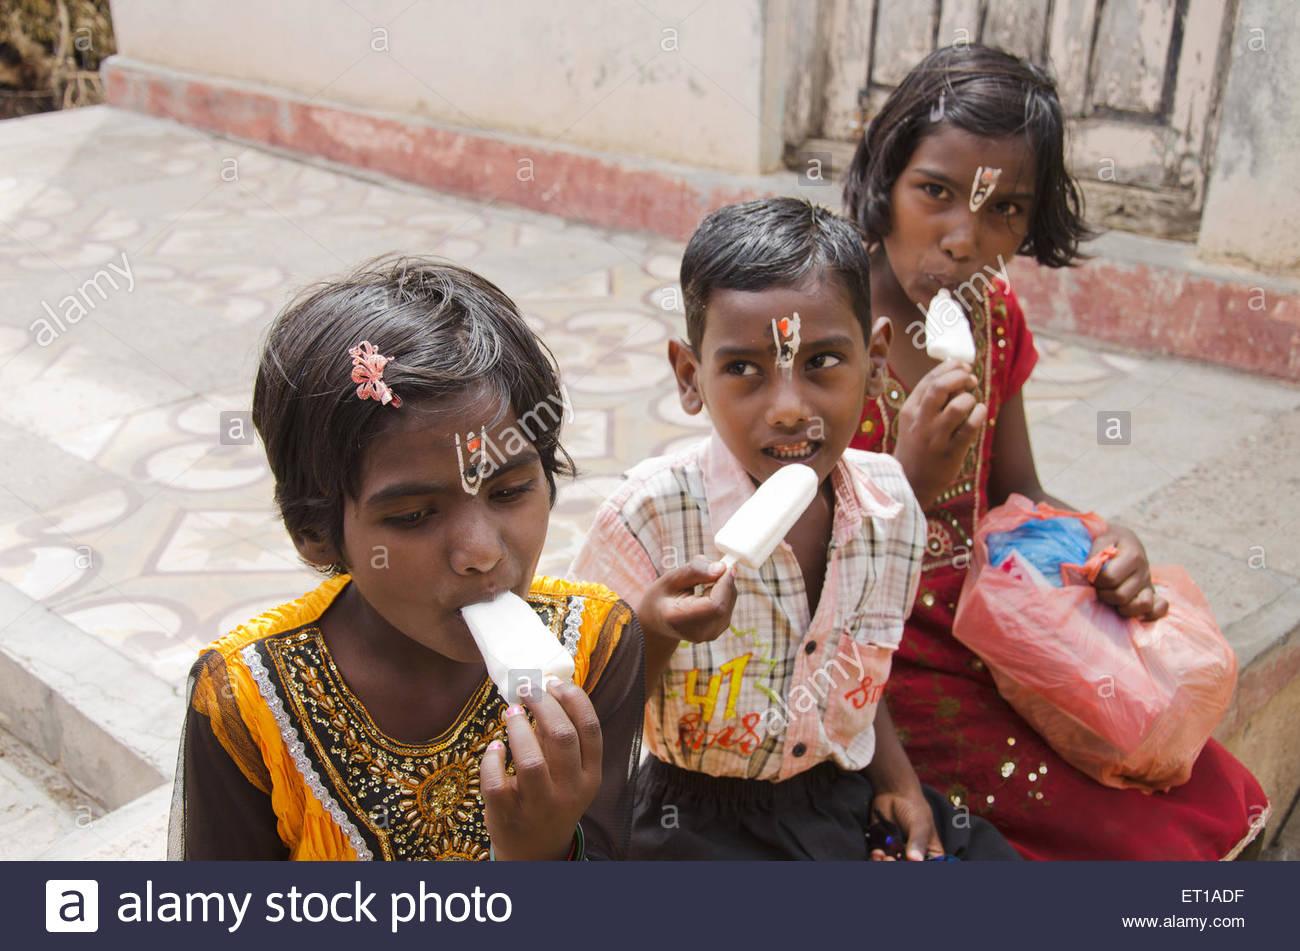 children eating ice creams Pandharpur Maharashtra India Asia MR#RRS005 - Stock Image